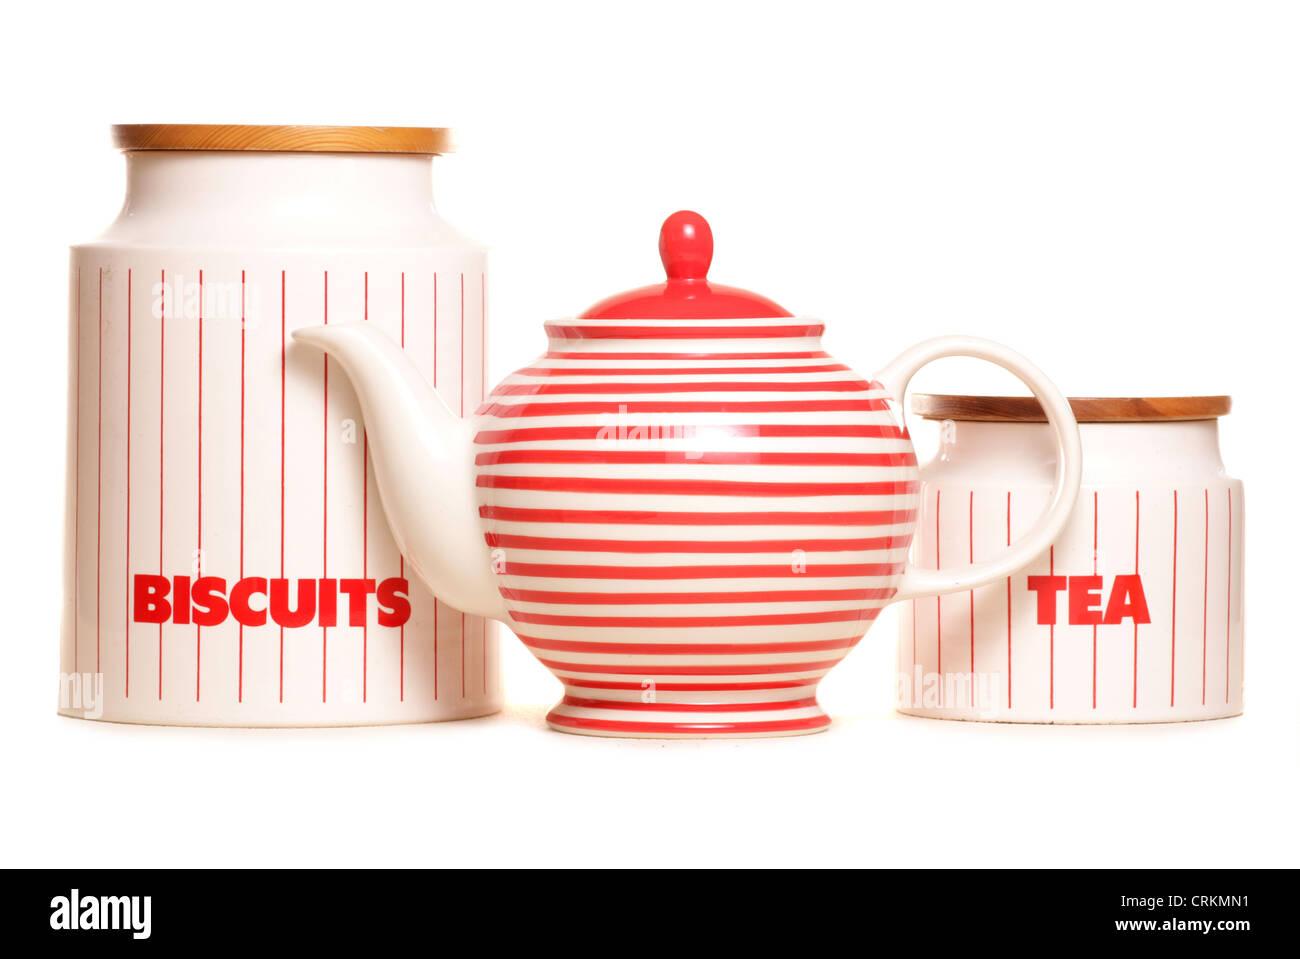 teapot and storage tins studio cutout - Stock Image